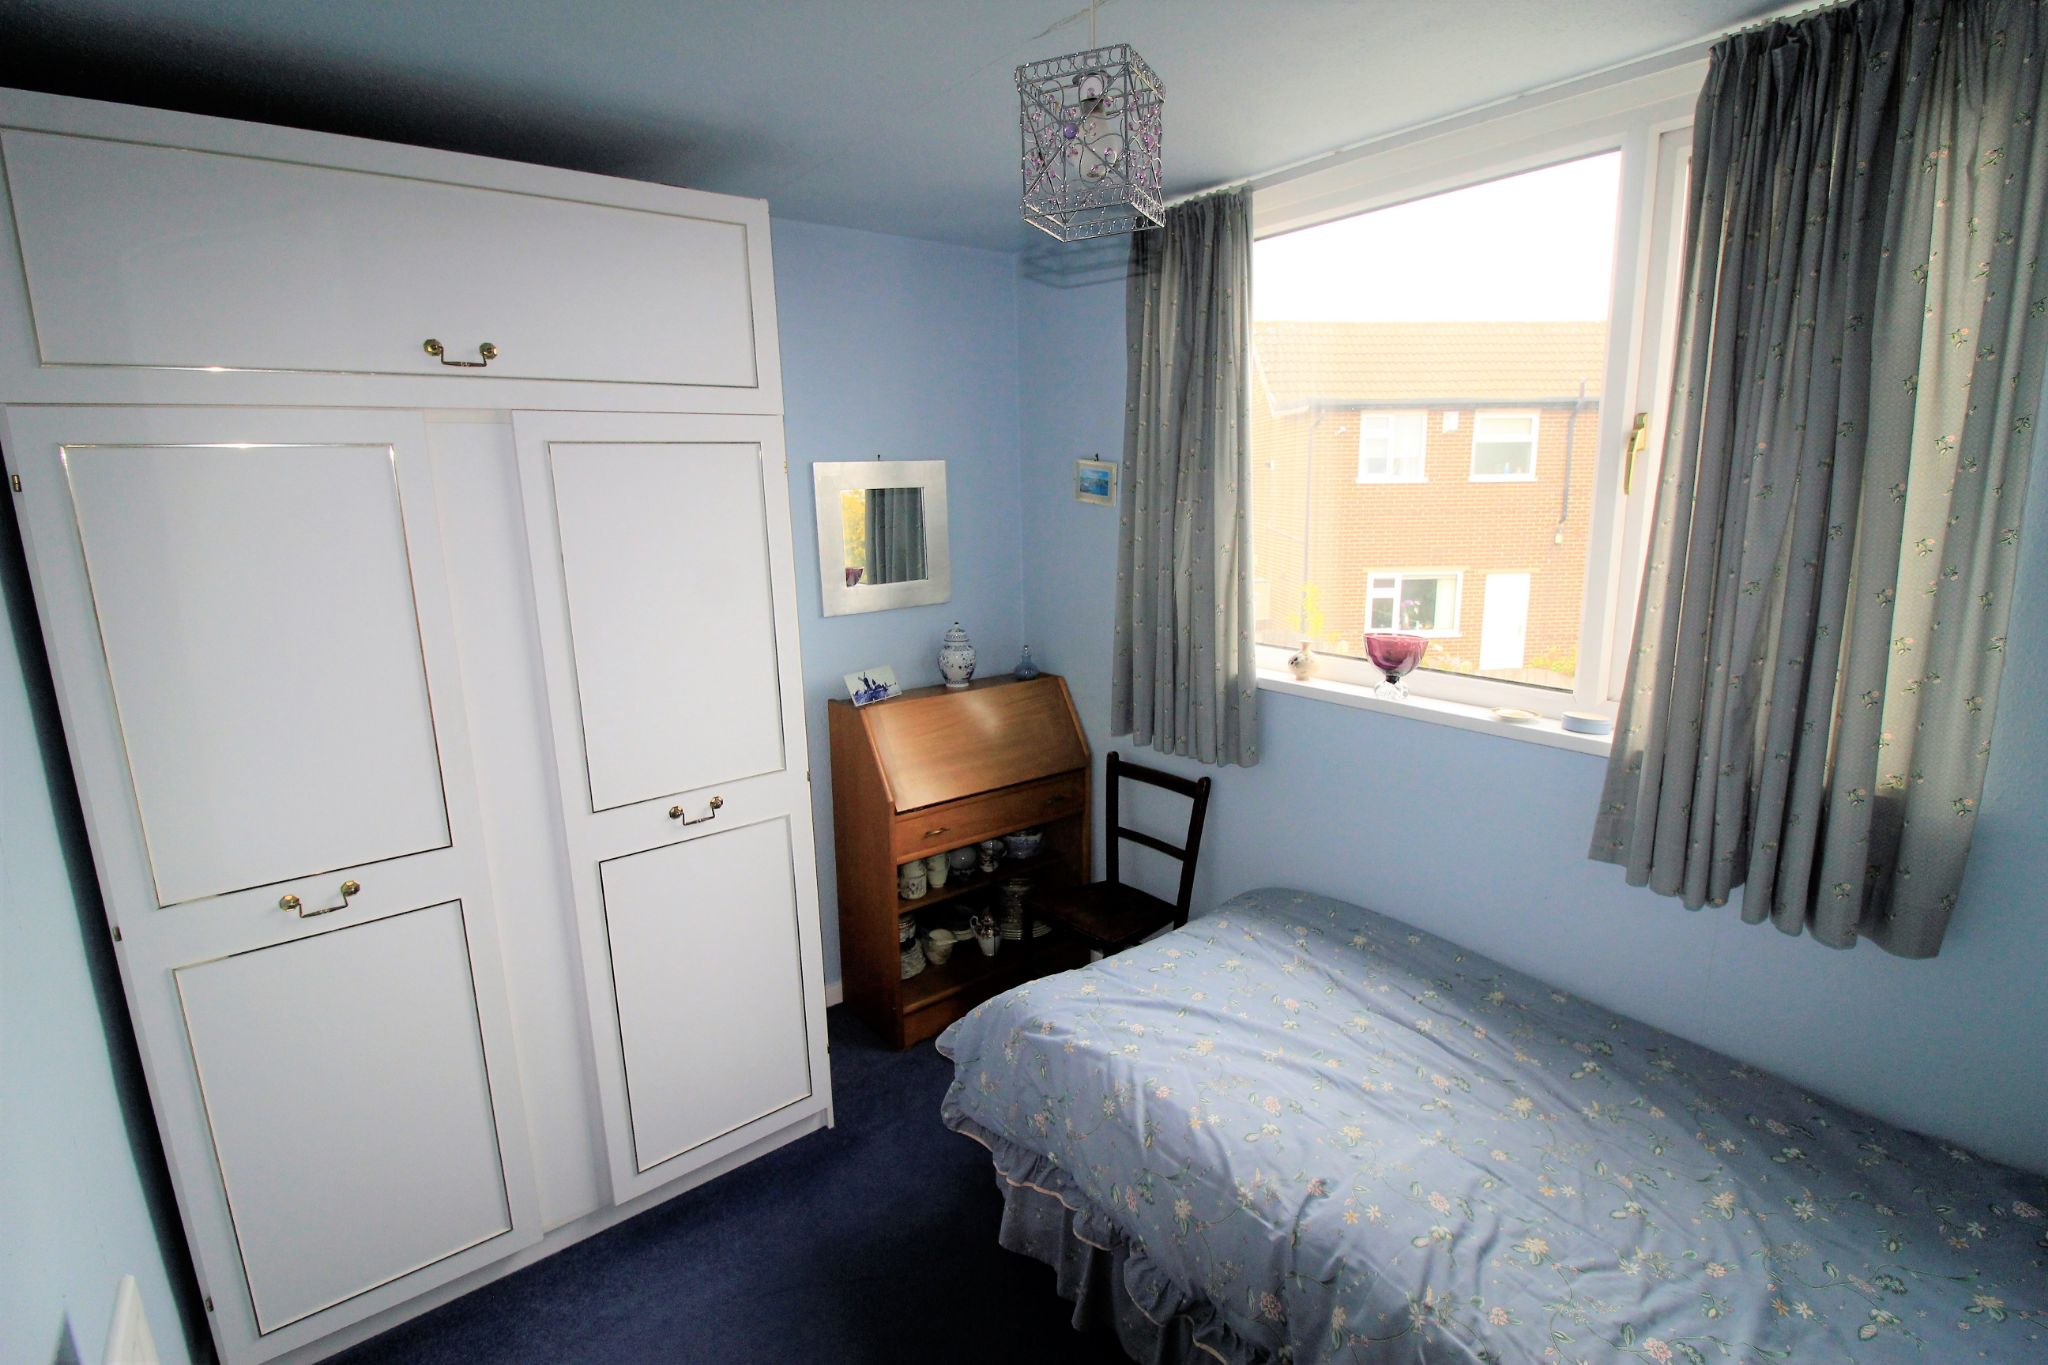 2 bedroom semi-detached bungalow SSTC in Bradford - Bathroom 2